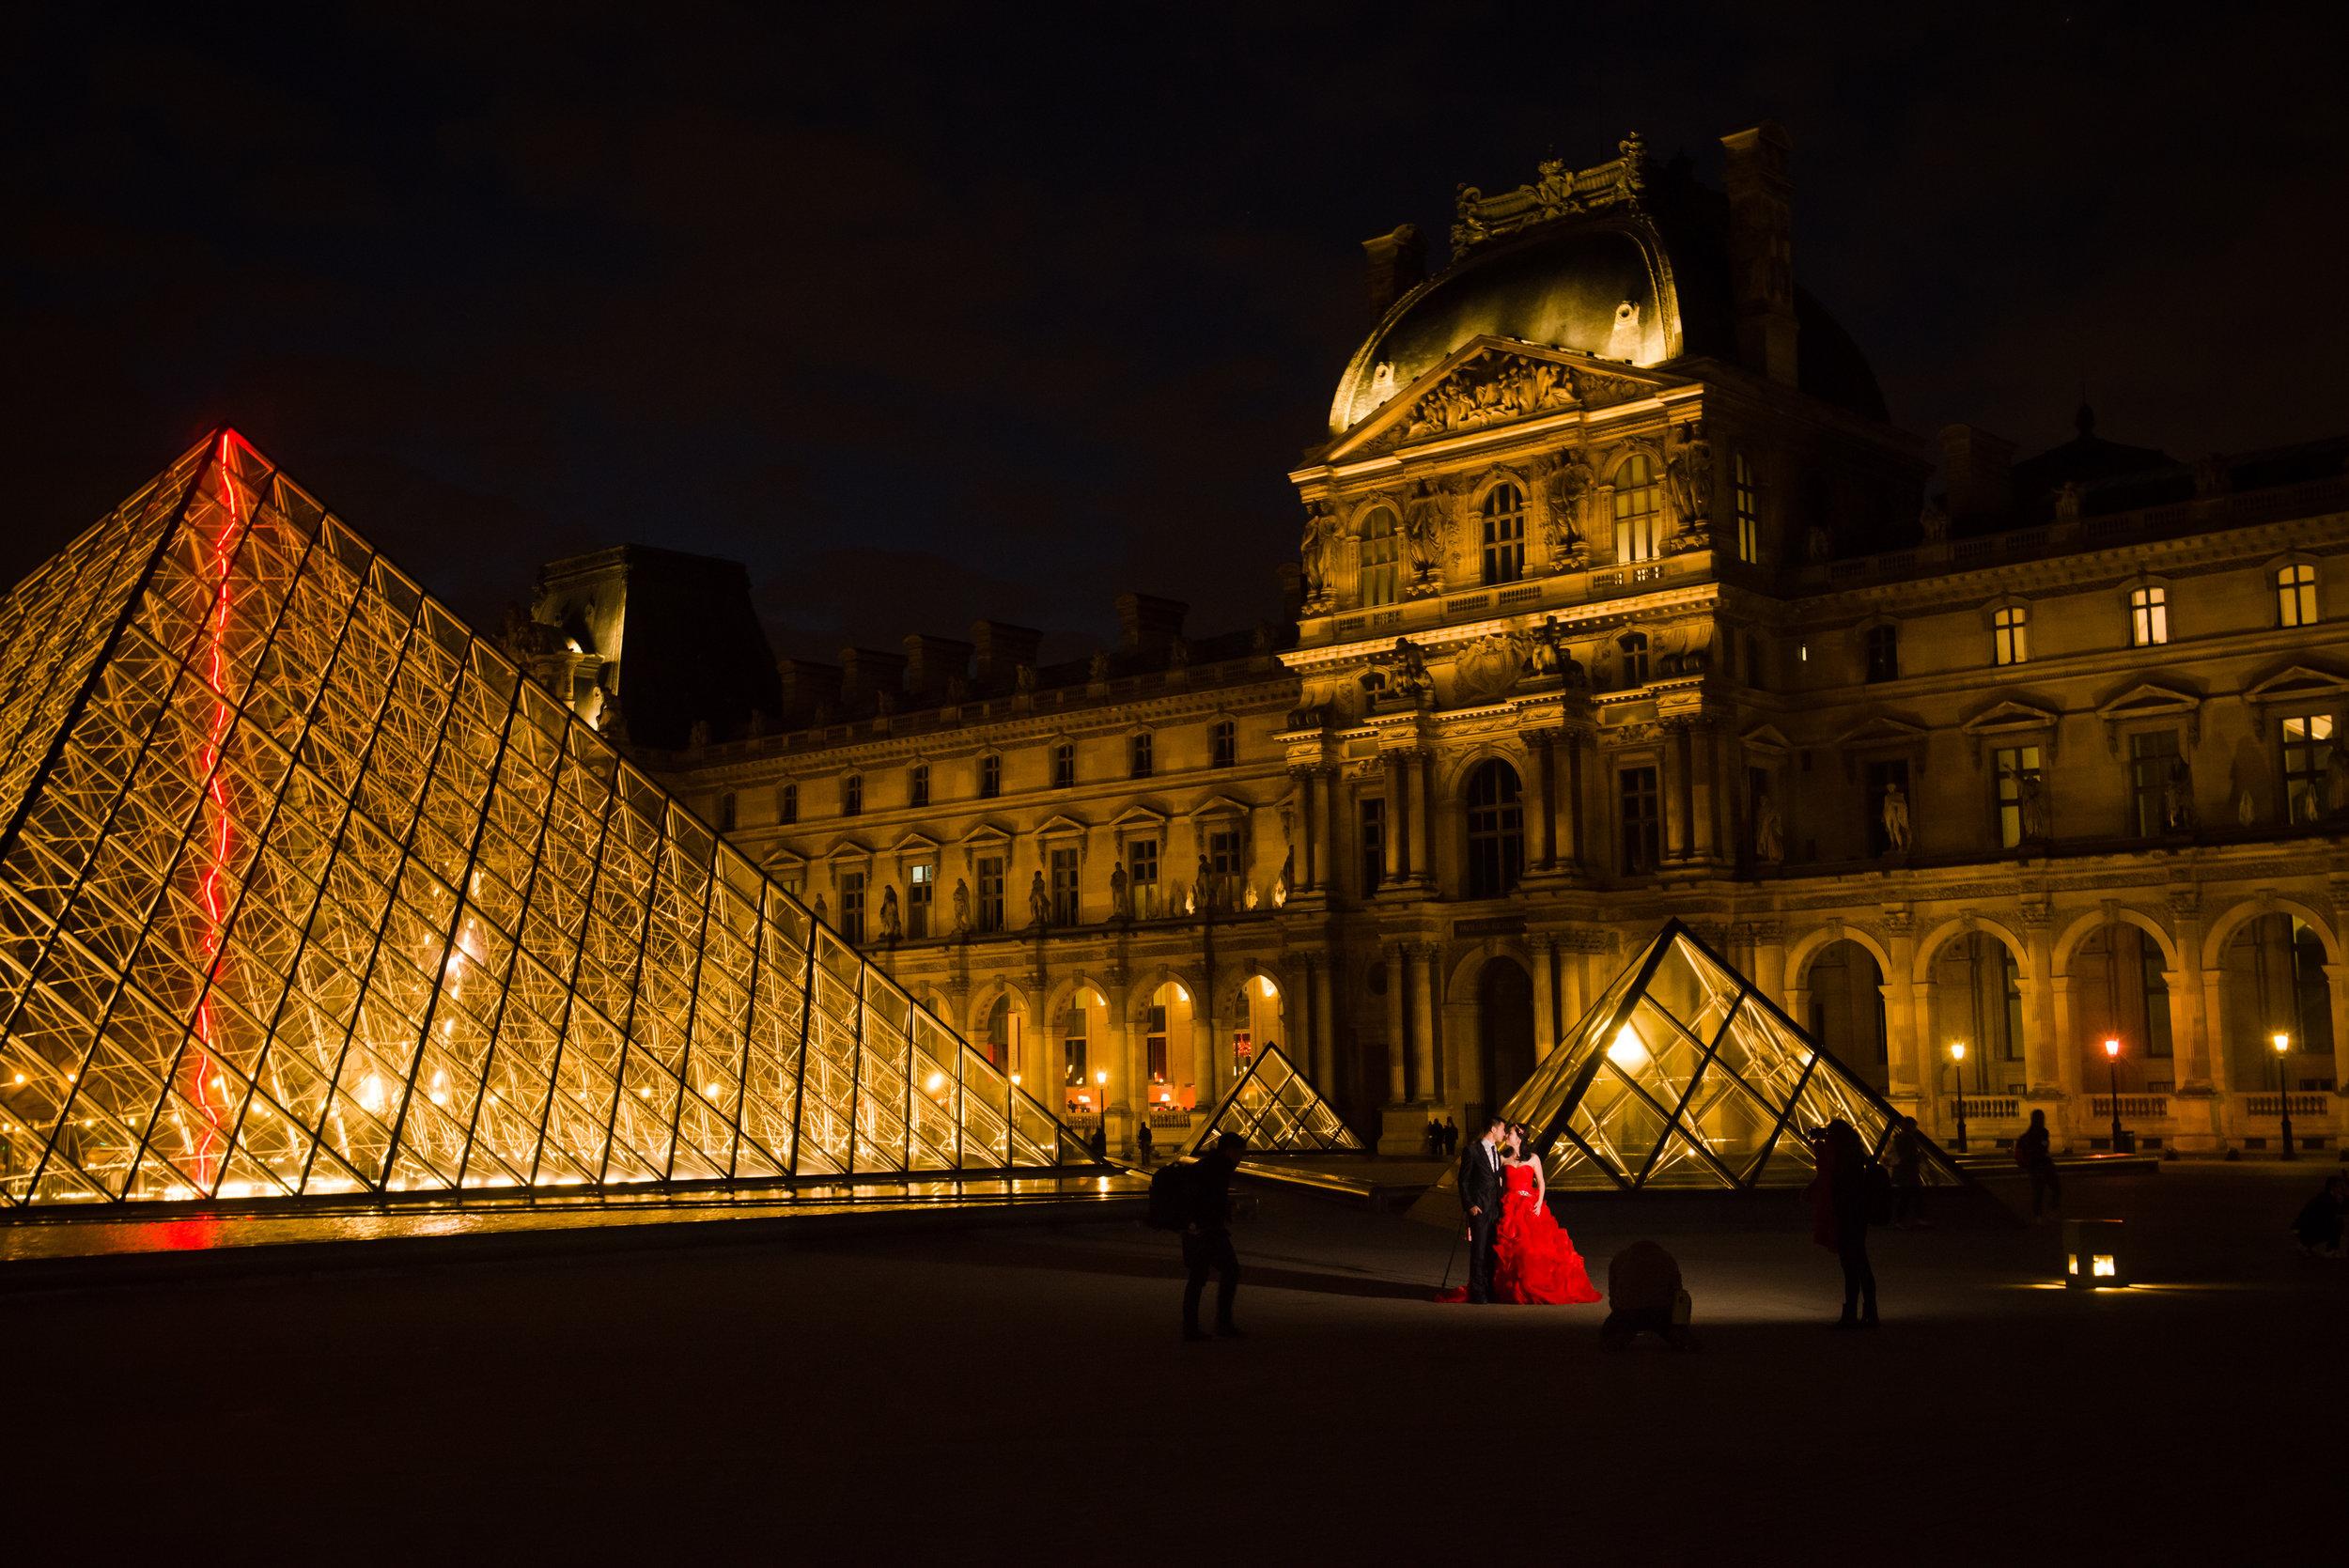 20150427_ppt_Louvre_004.jpg